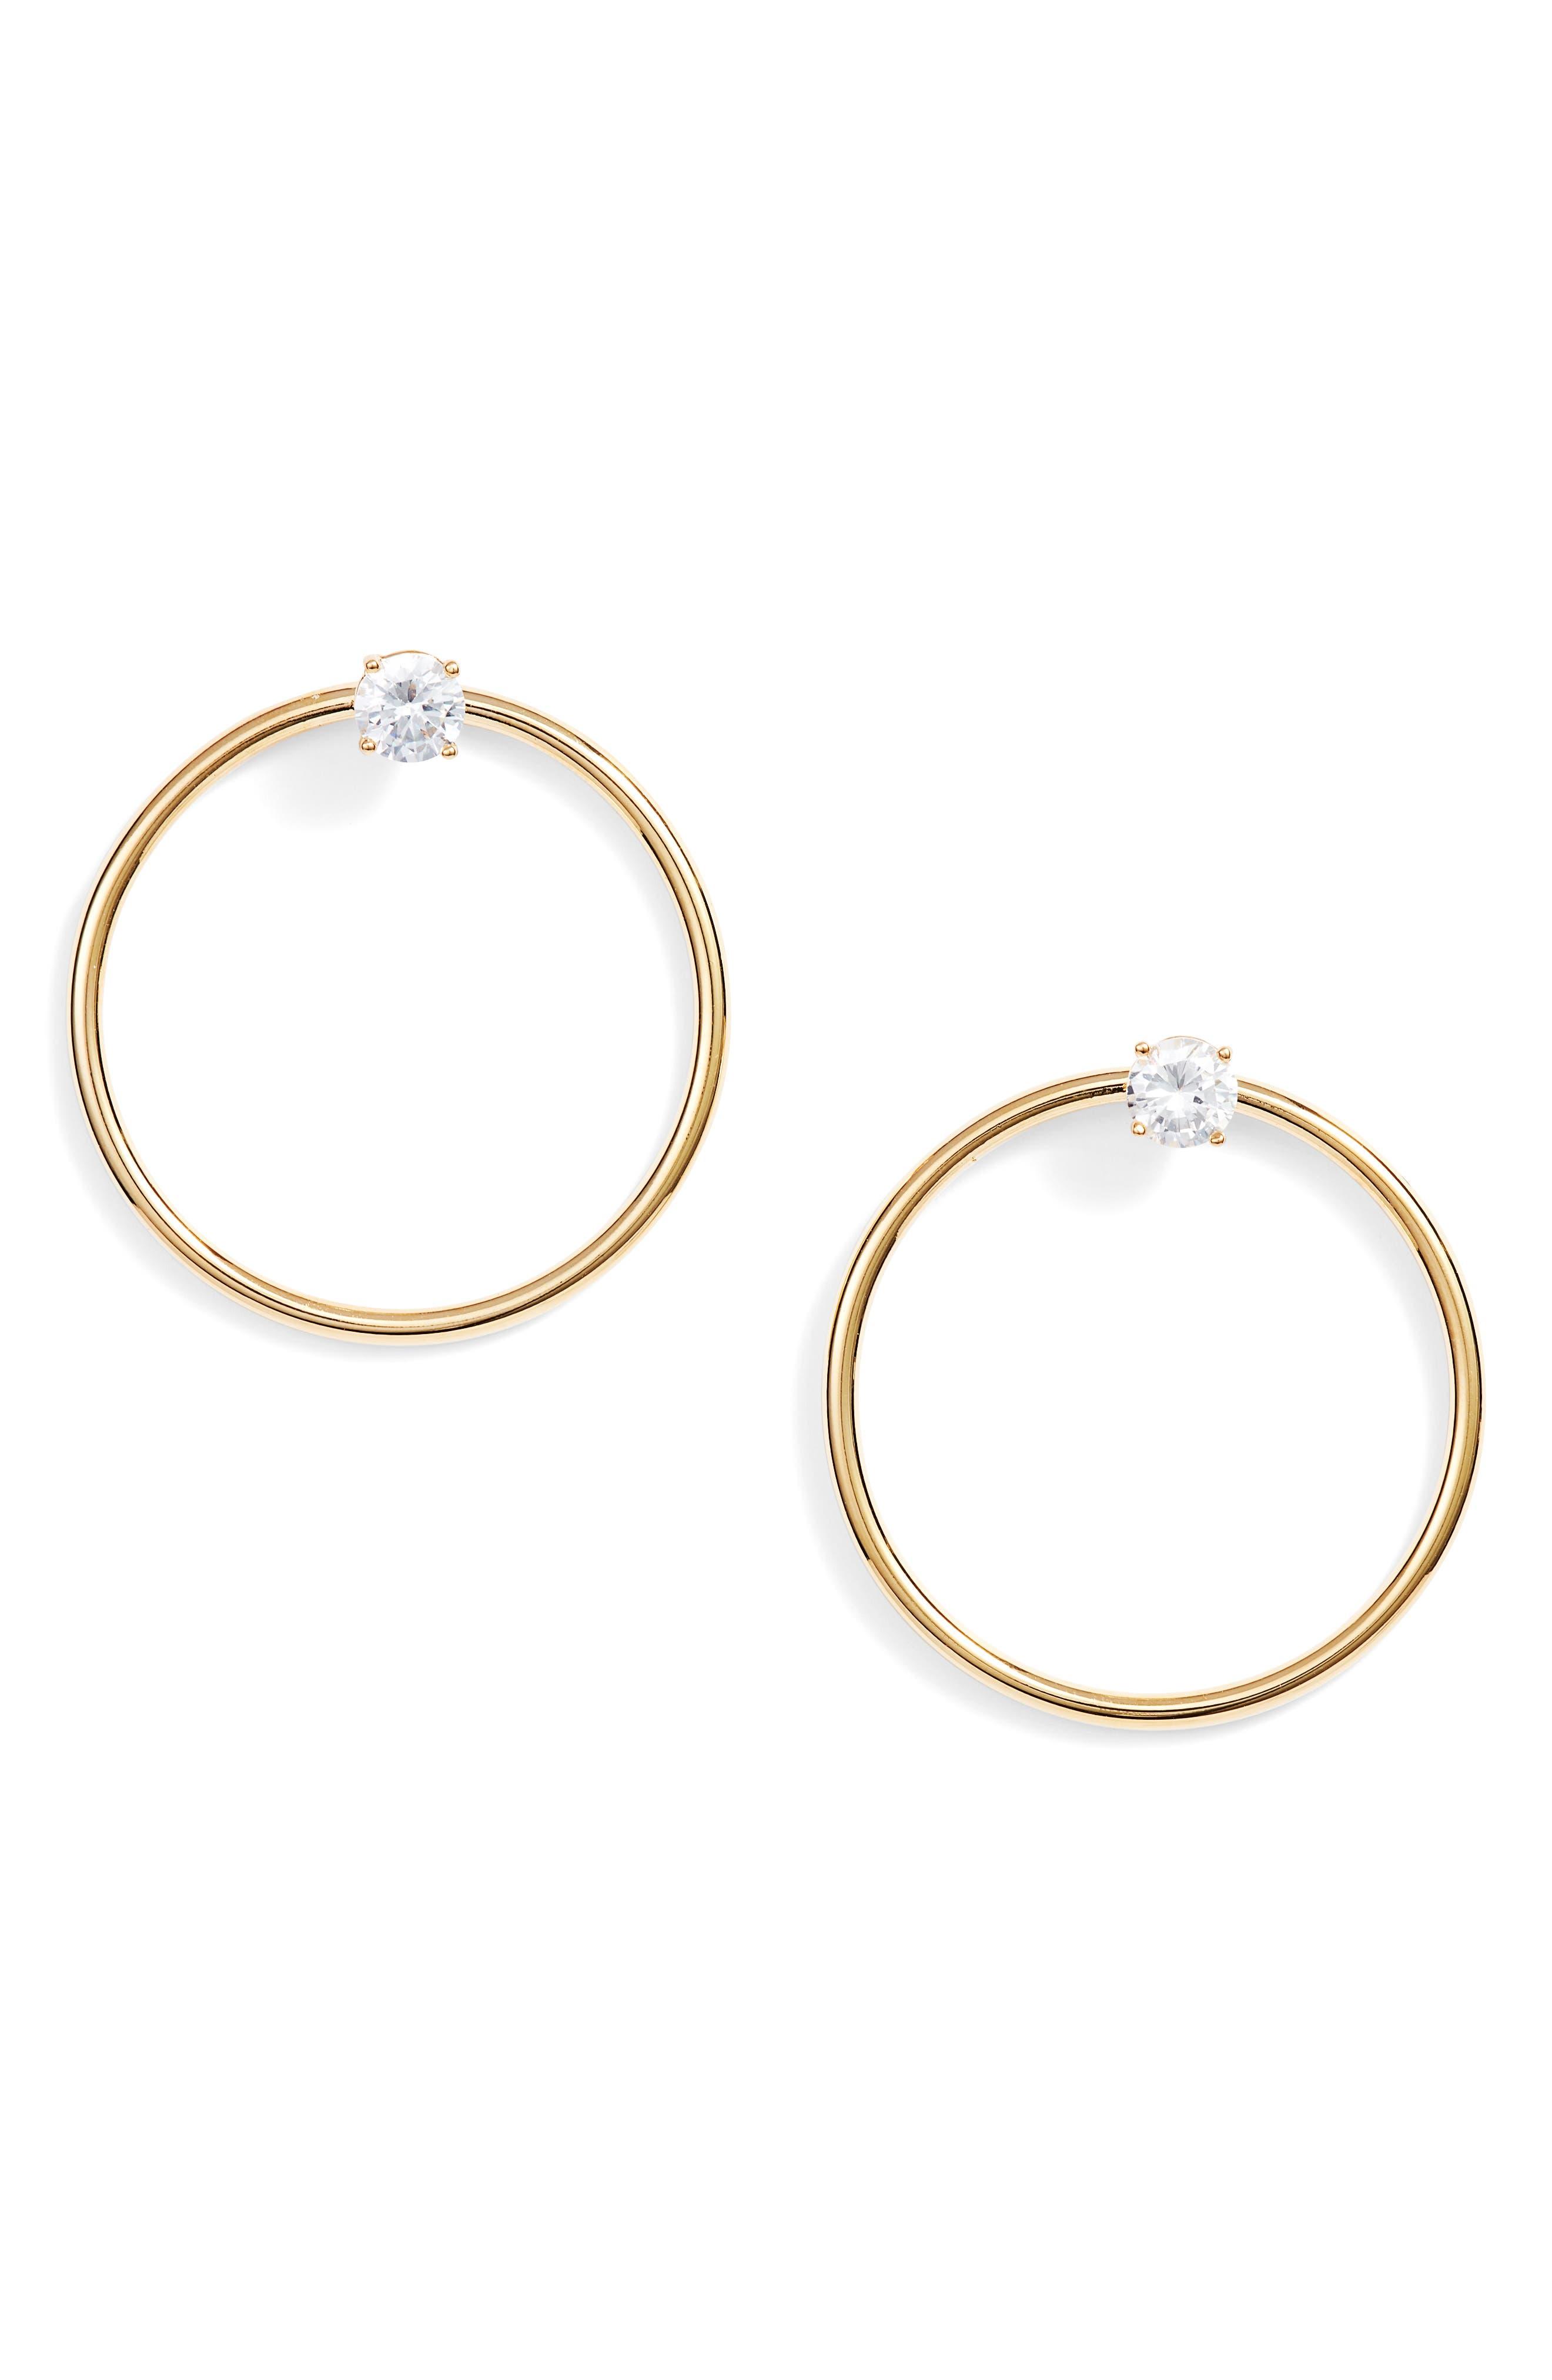 Crystal Stud Hoop Earrings,                             Main thumbnail 1, color,                             Gold